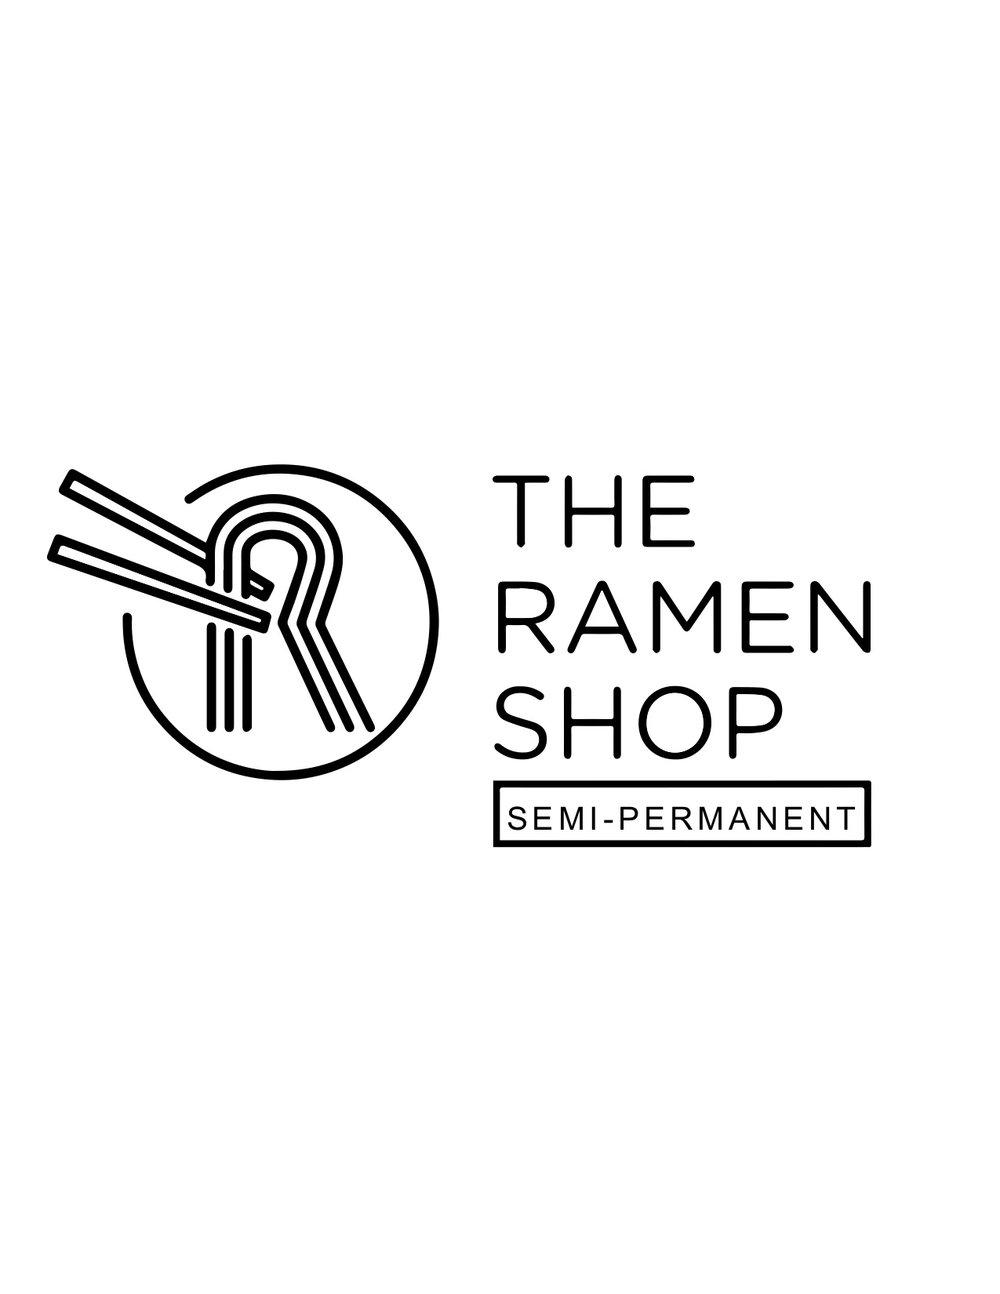 THE RAMEN SHOP LOGO SEMIP.jpg